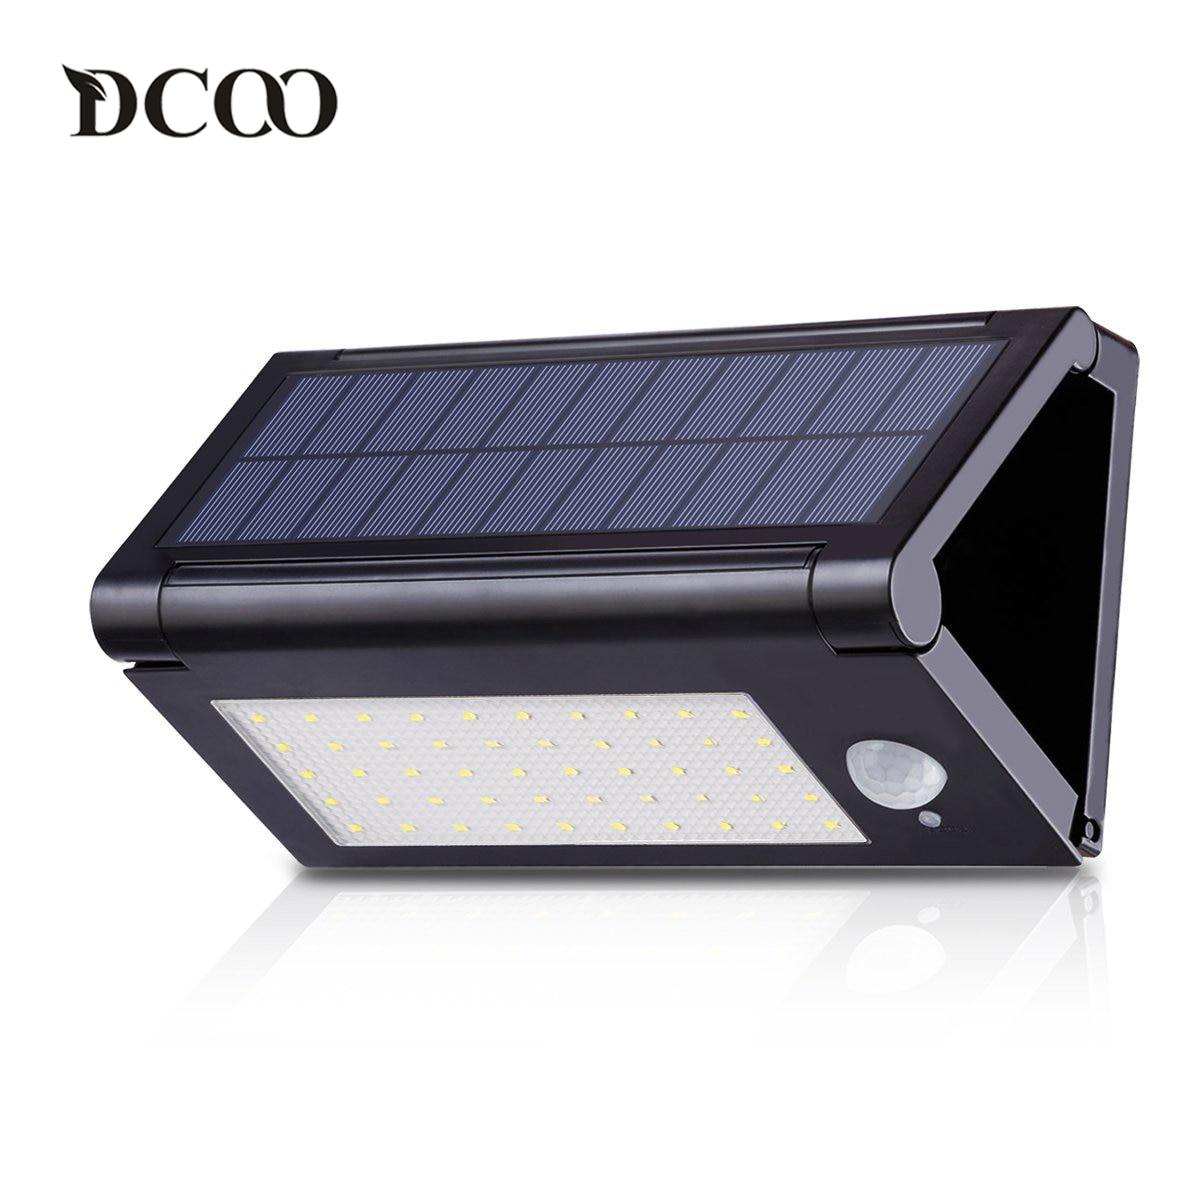 Dcoo Solar Lights 50leds Foldable Motion Sensor Outdoor Light 3 Modes Garden Solar Light Led Solar Outdoor Luz Solar Panel